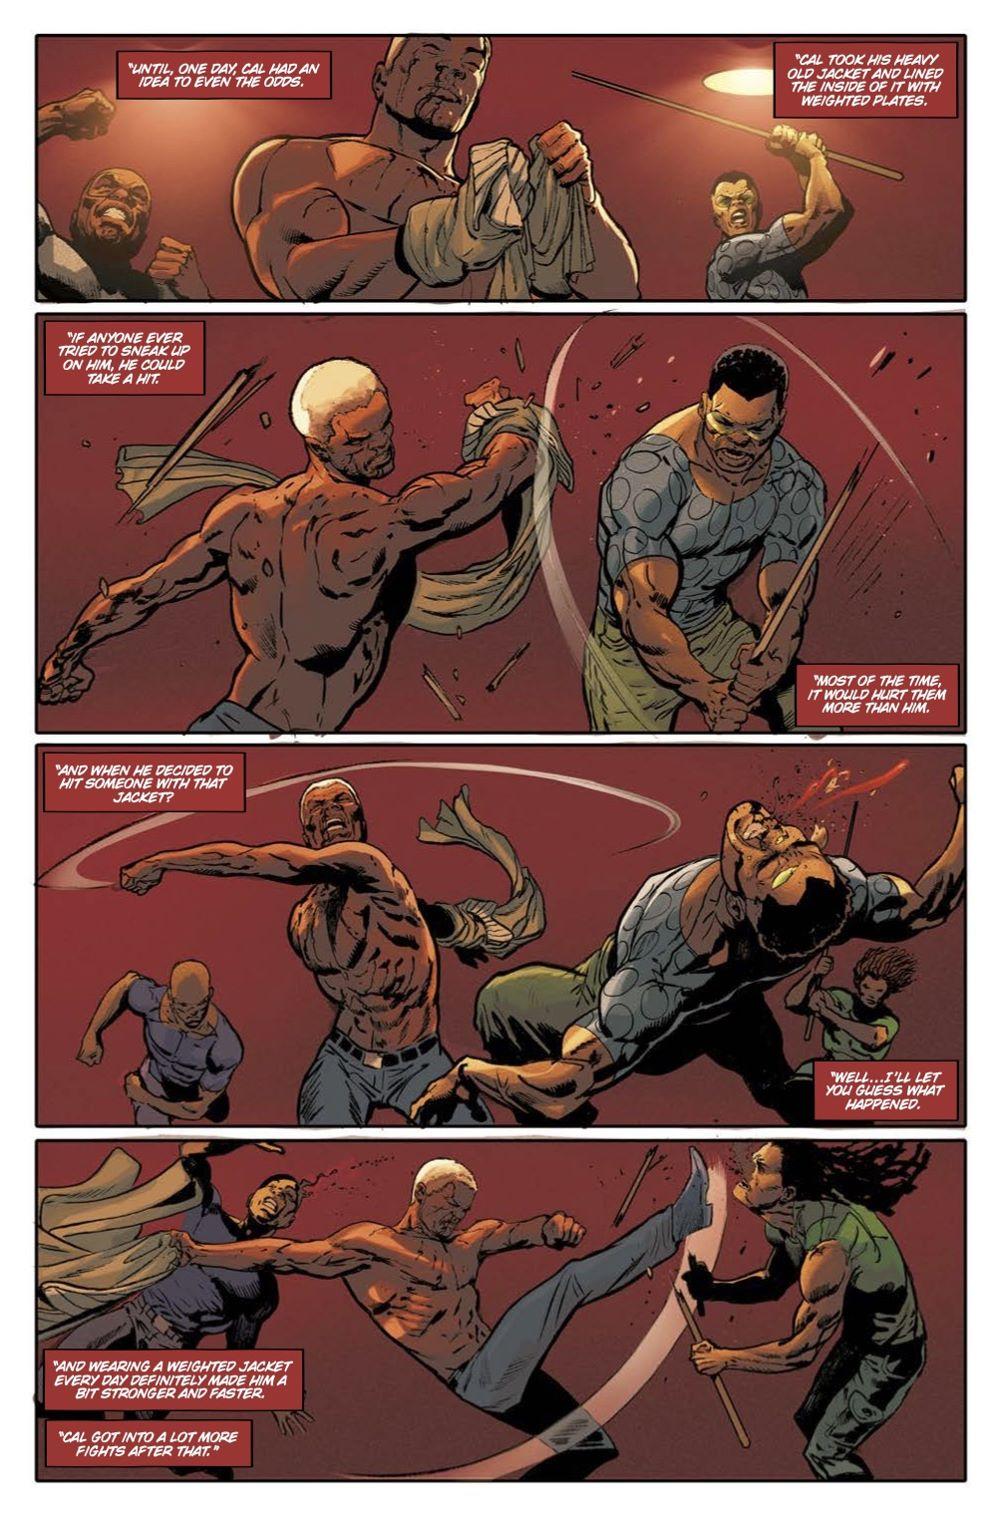 Blade-Runner-Origins-6-Page-5 ComicList Previews: BLADE RUNNER ORIGINS #6